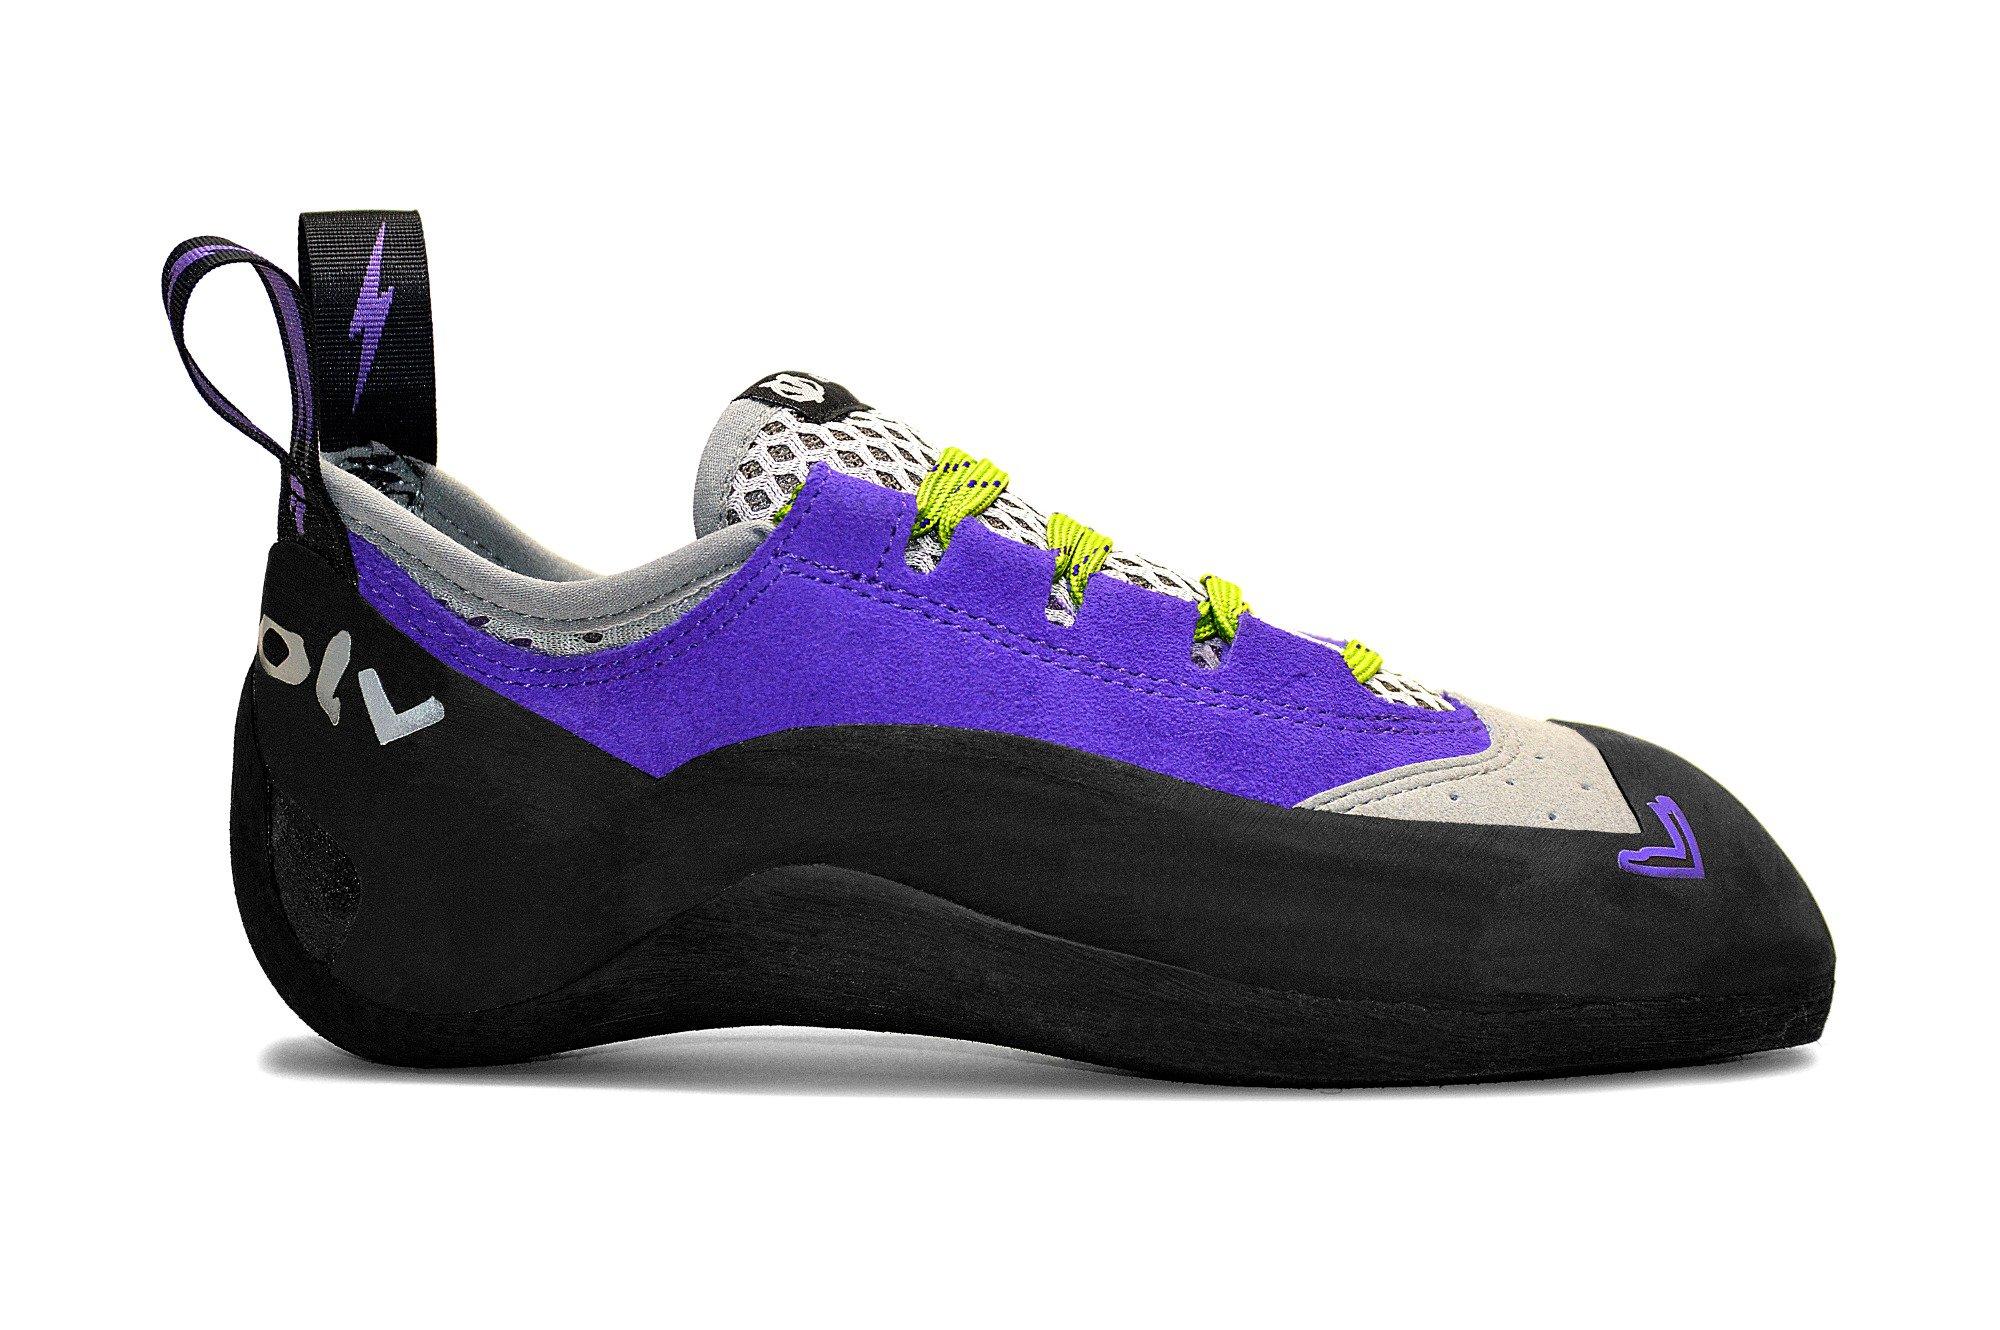 Evolv Nikita Climbing Shoe - Women's Violet/Gray 6